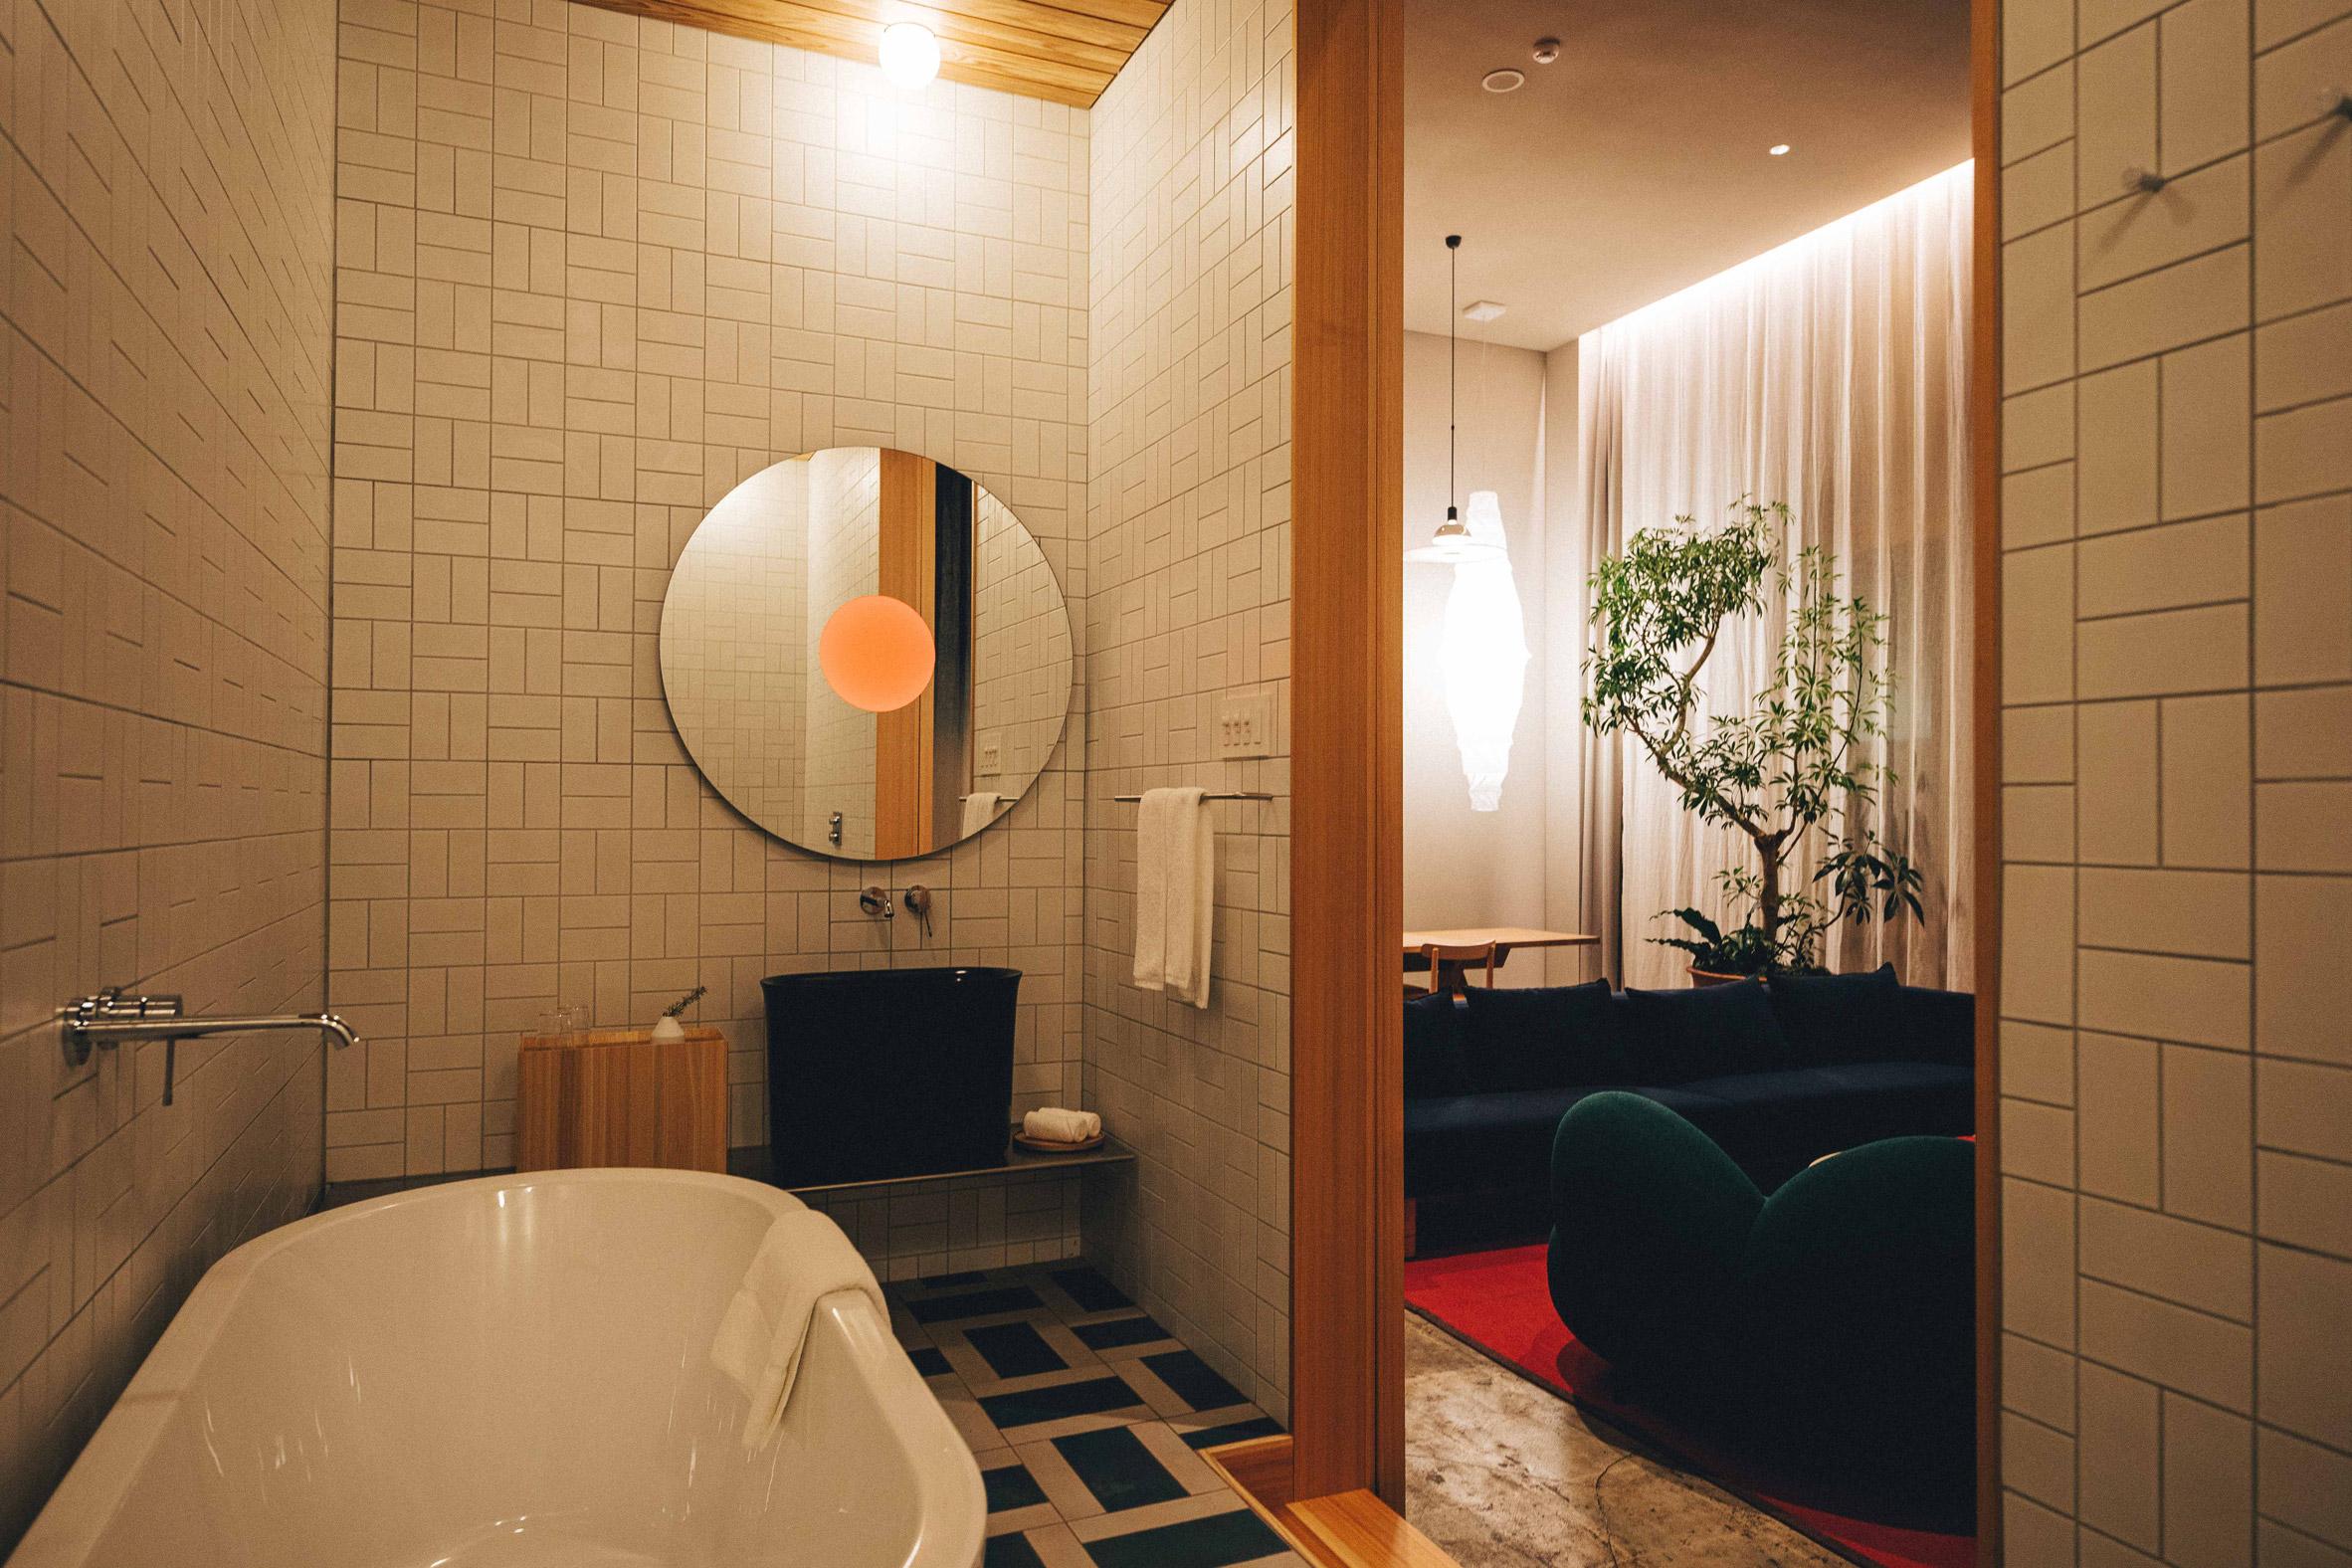 K5 Tokyo hotel by Claesson Koivisto Rune bathroom